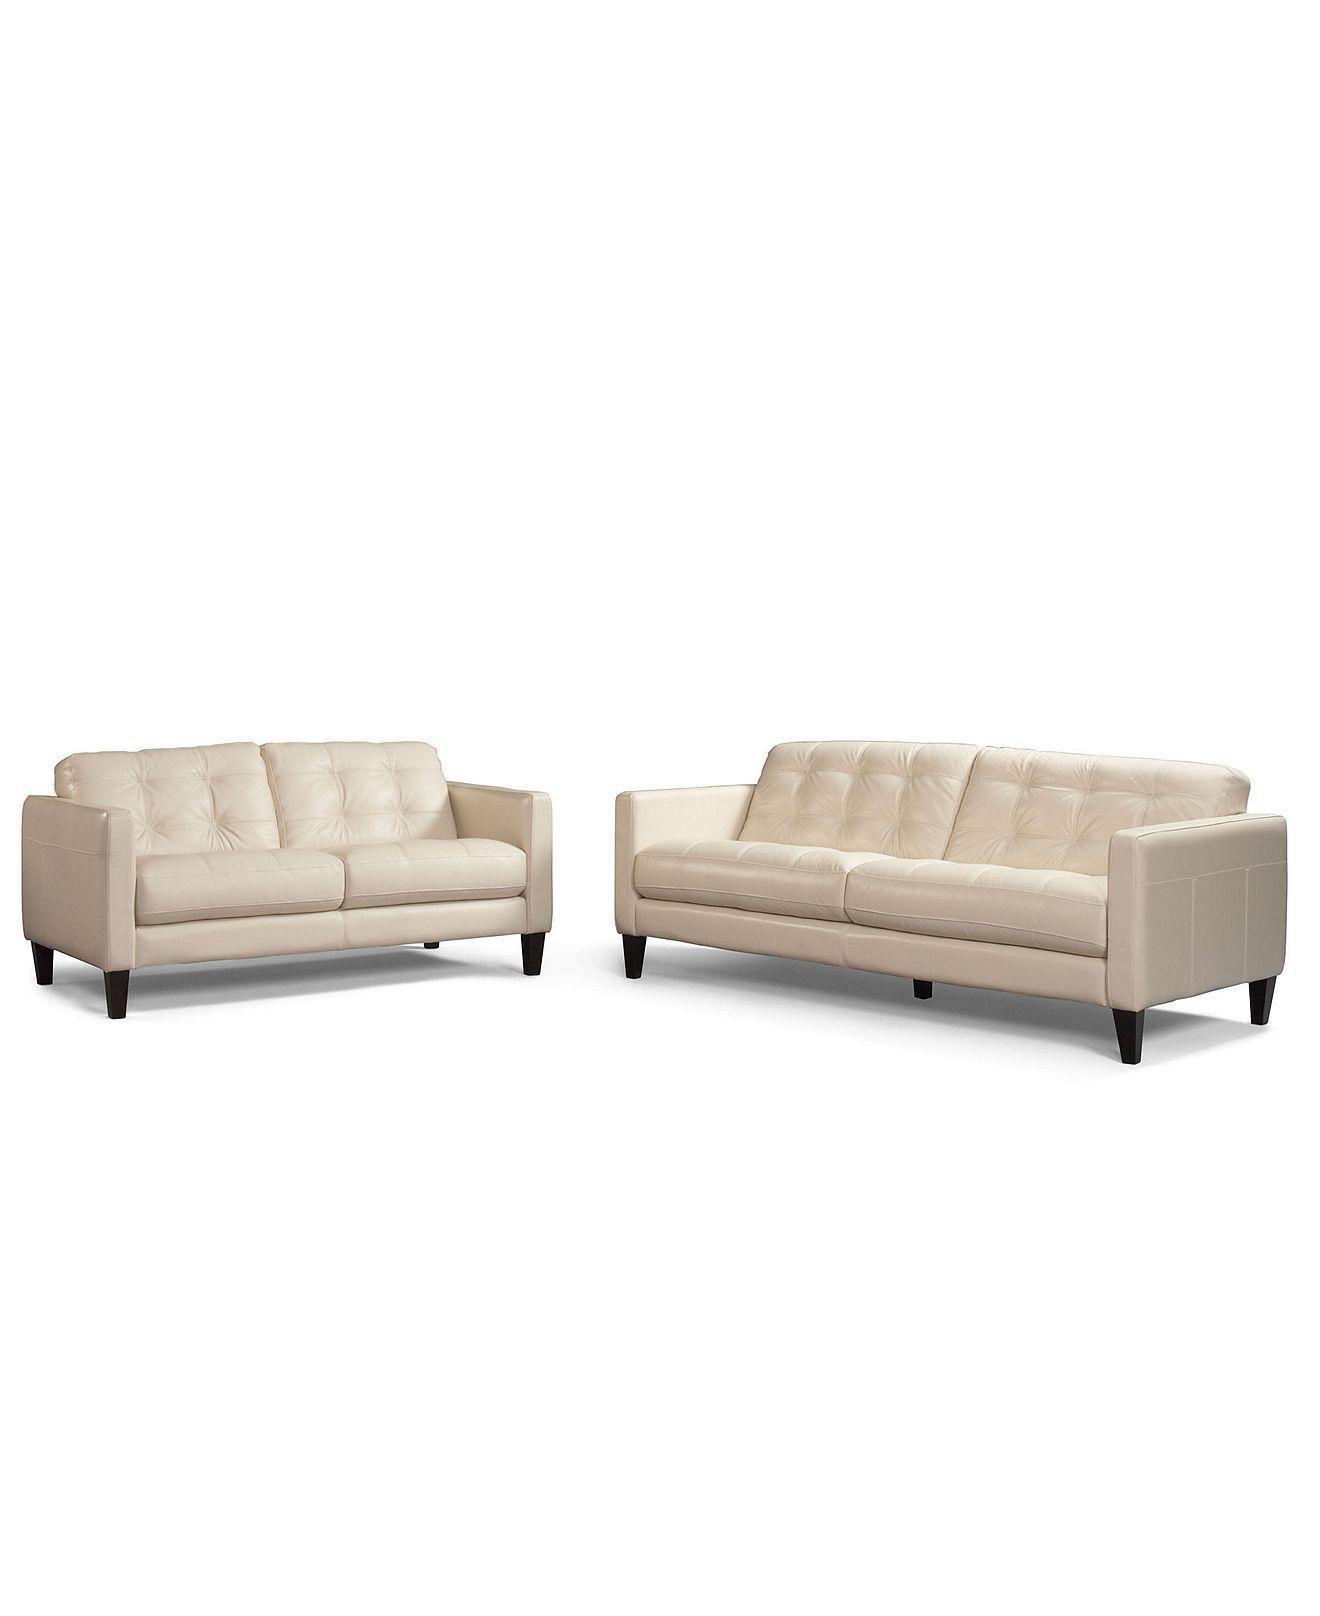 Milan 2 Piece Leather Sofa Set: Sofa And Love Seat   Furniture   Macyu0027s